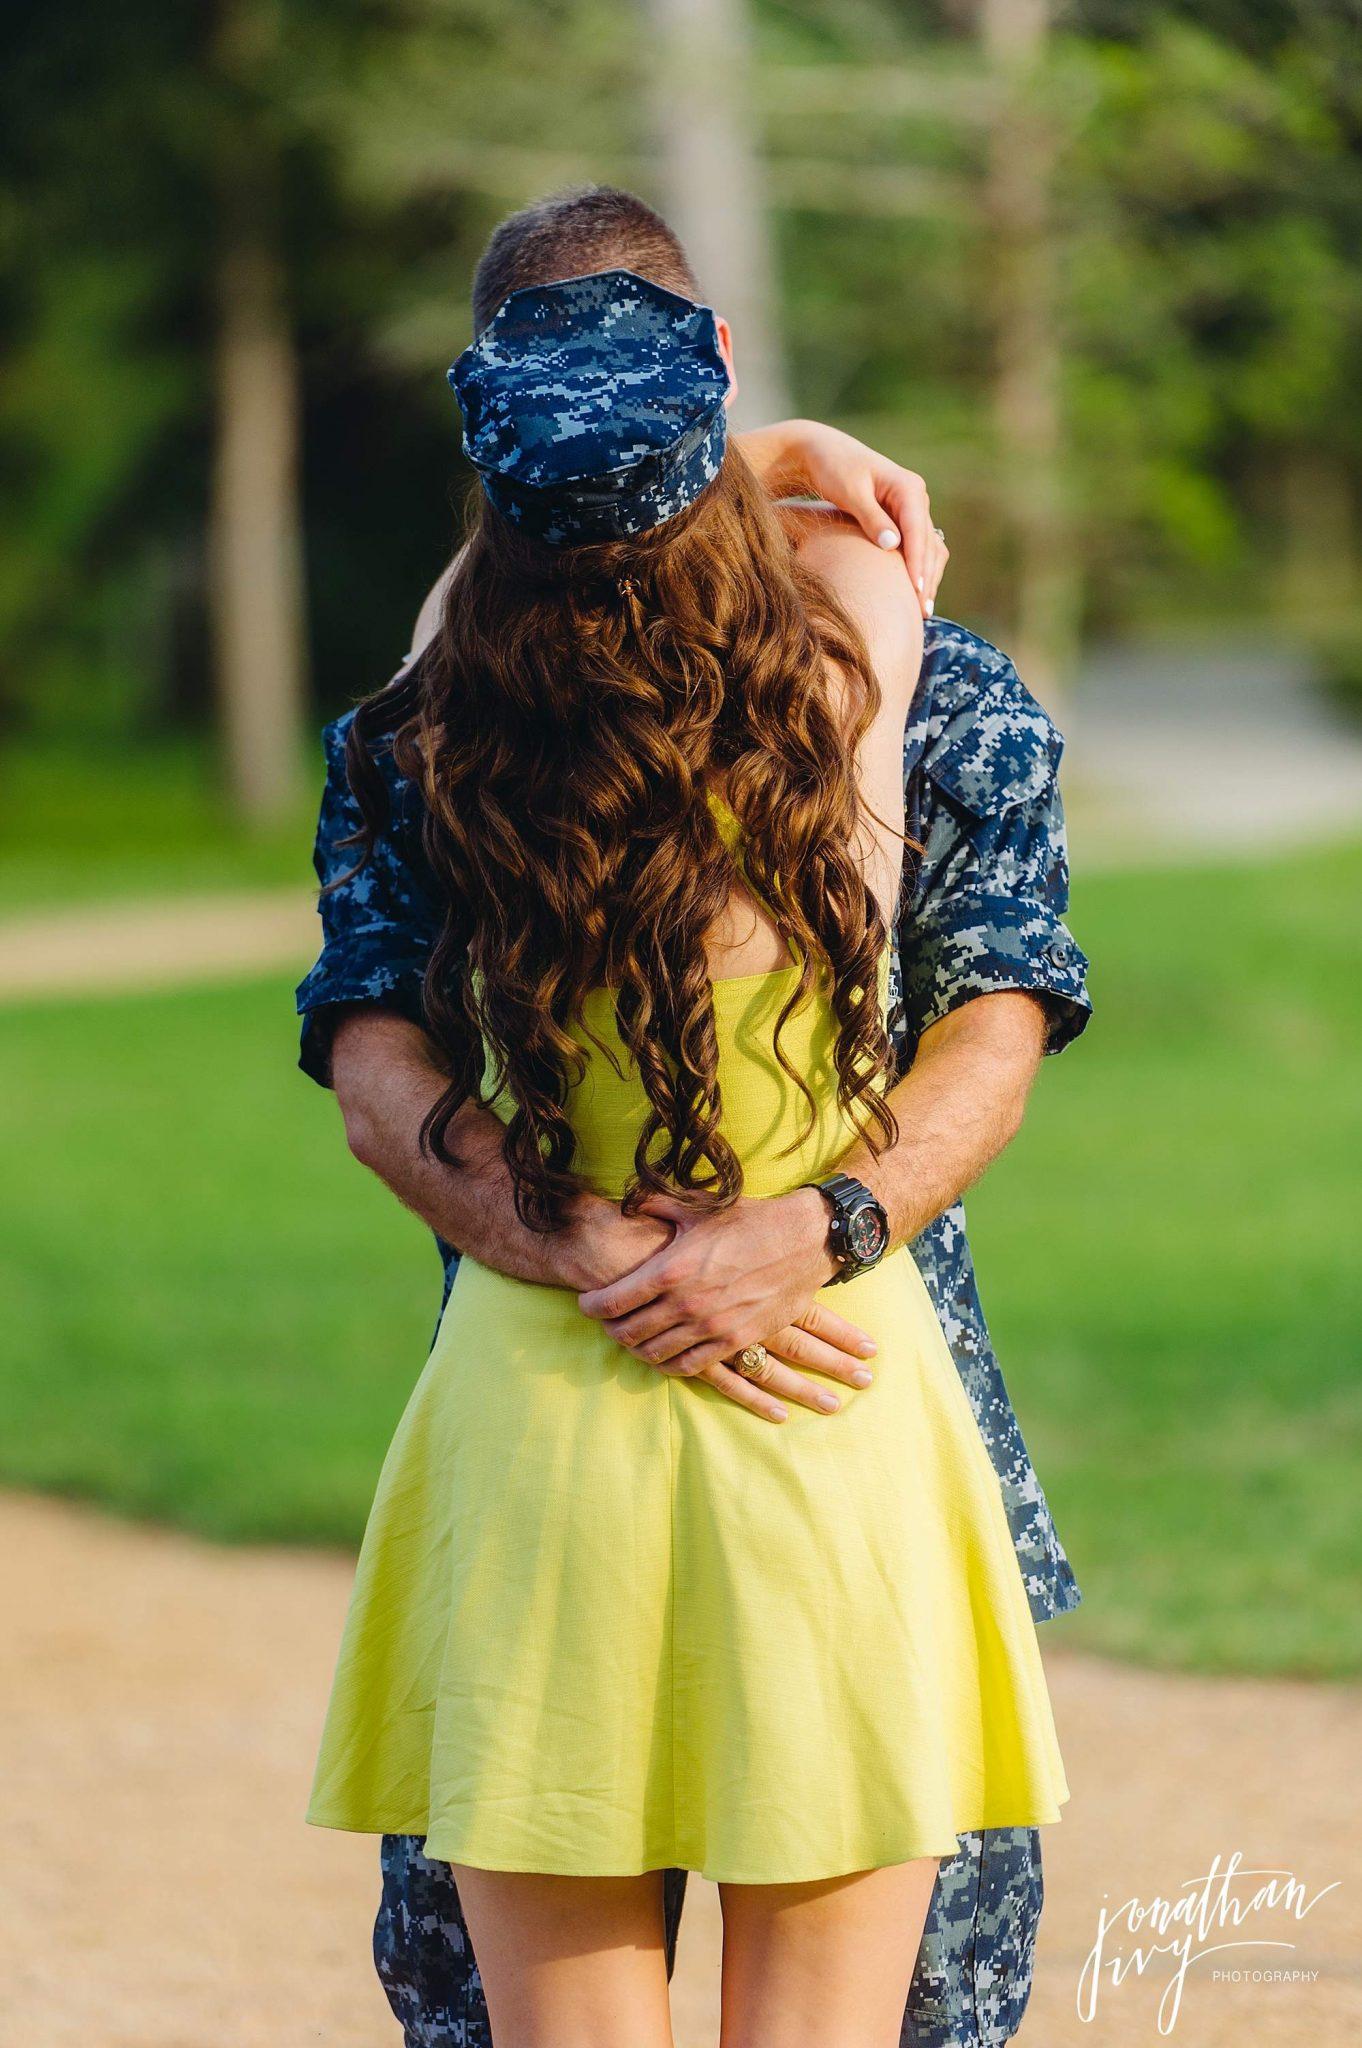 Romantic engagment photos with NYUs